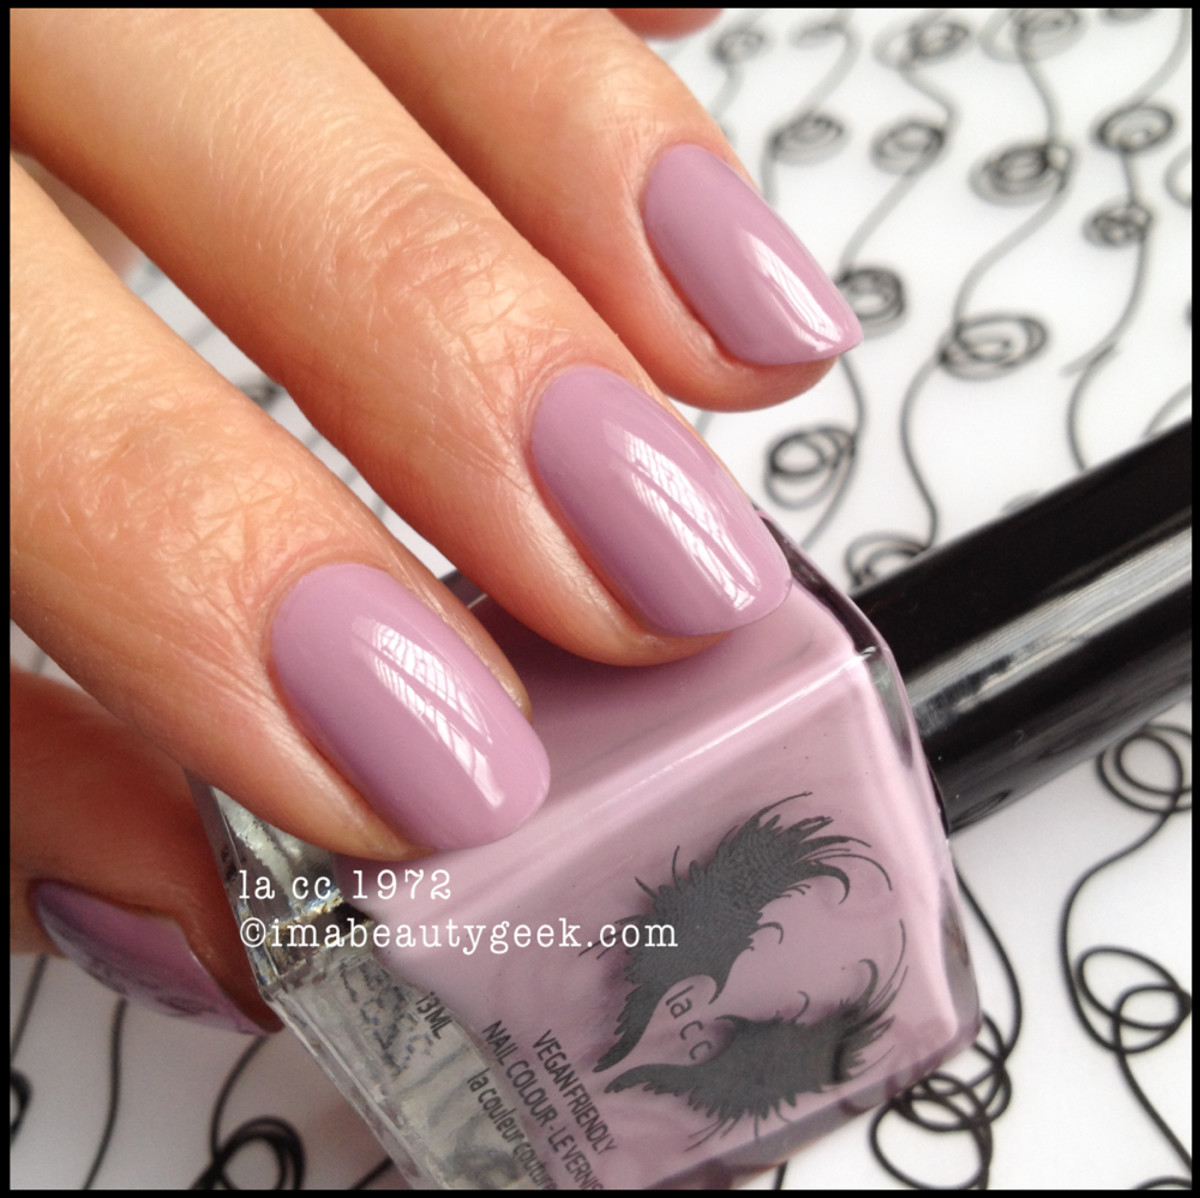 lacc polish 1972 beautygeeks